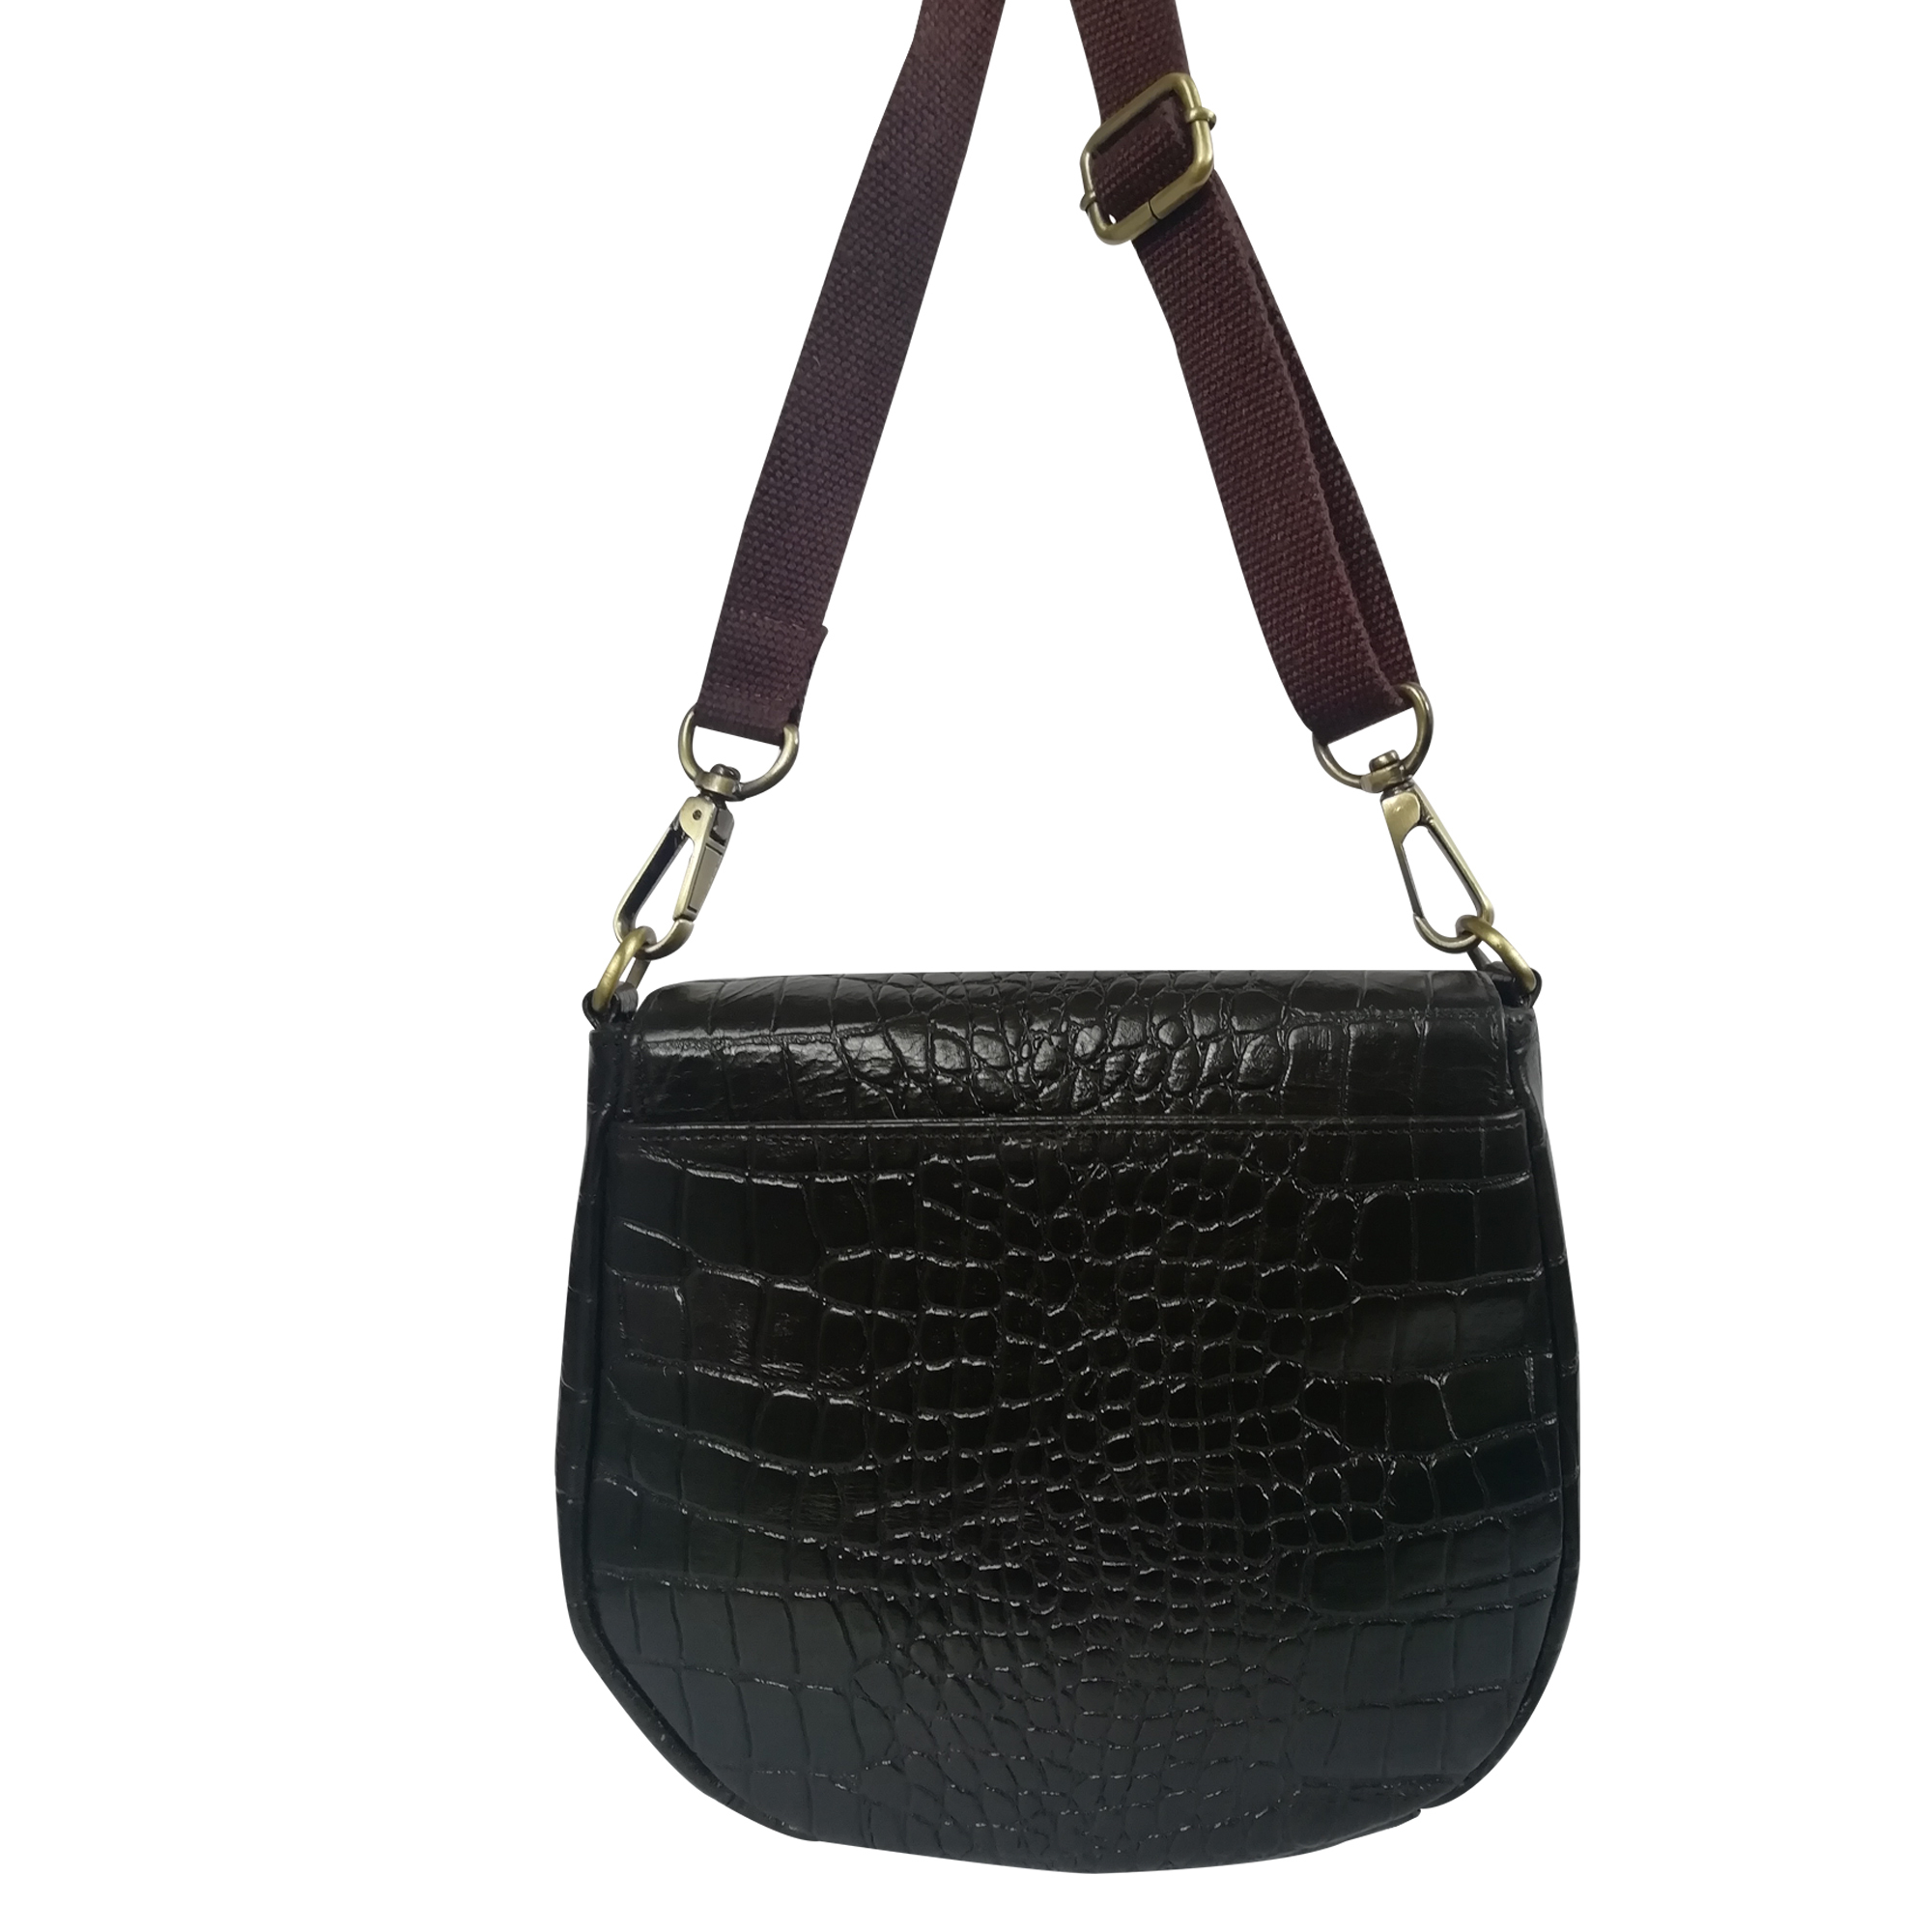 Women Leather Fashionable Sling Crossbody Shoulder Bag